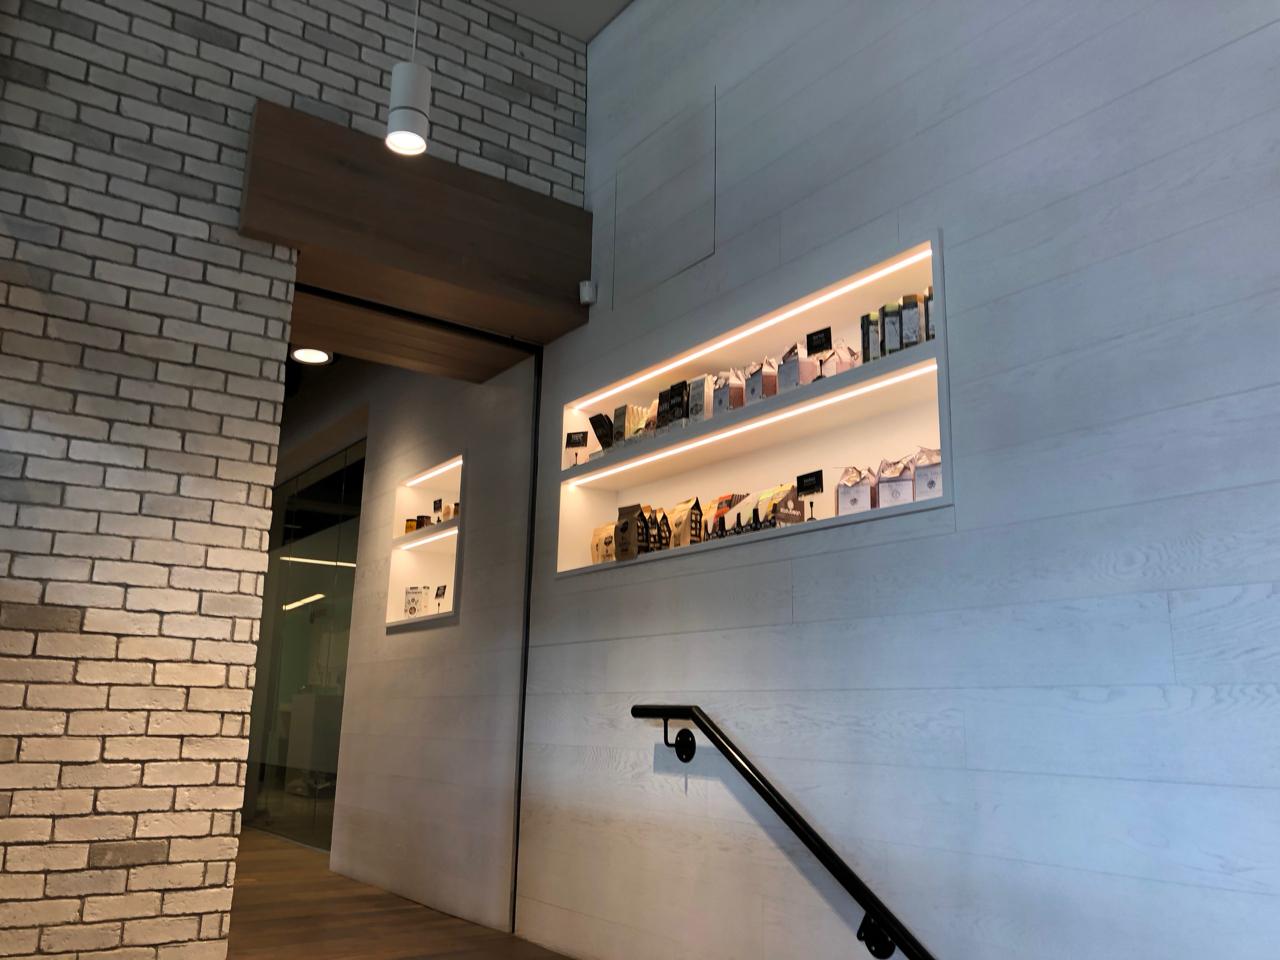 Product Display Shelving Lights Entrance